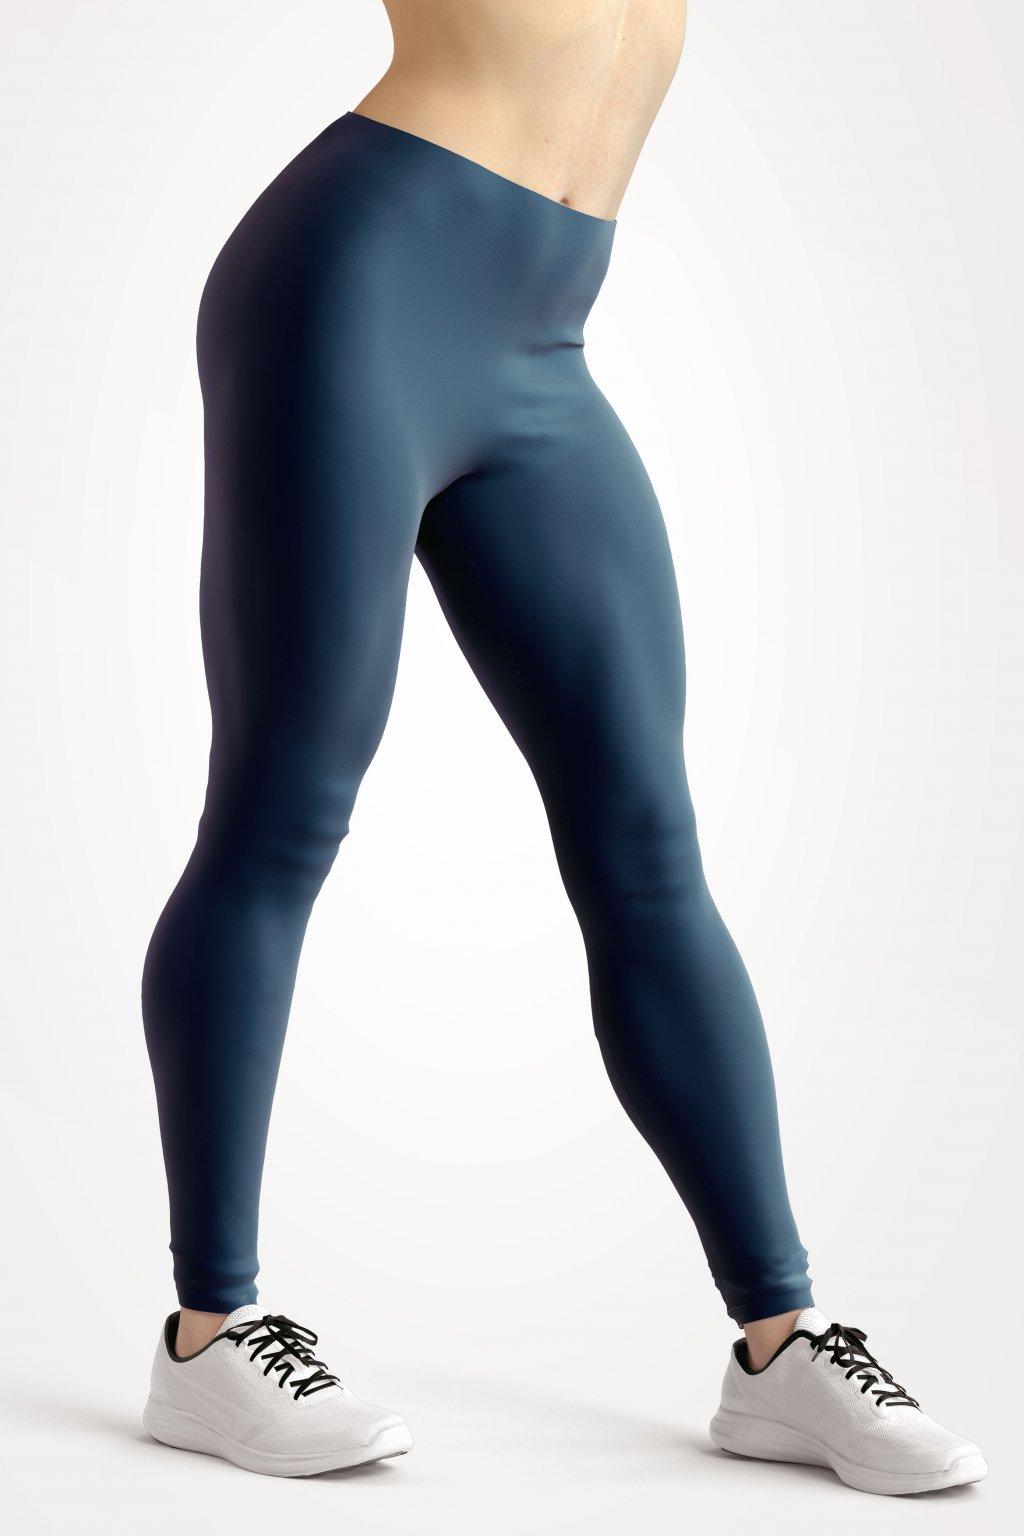 leggings petrol blue essentials front side by utopy